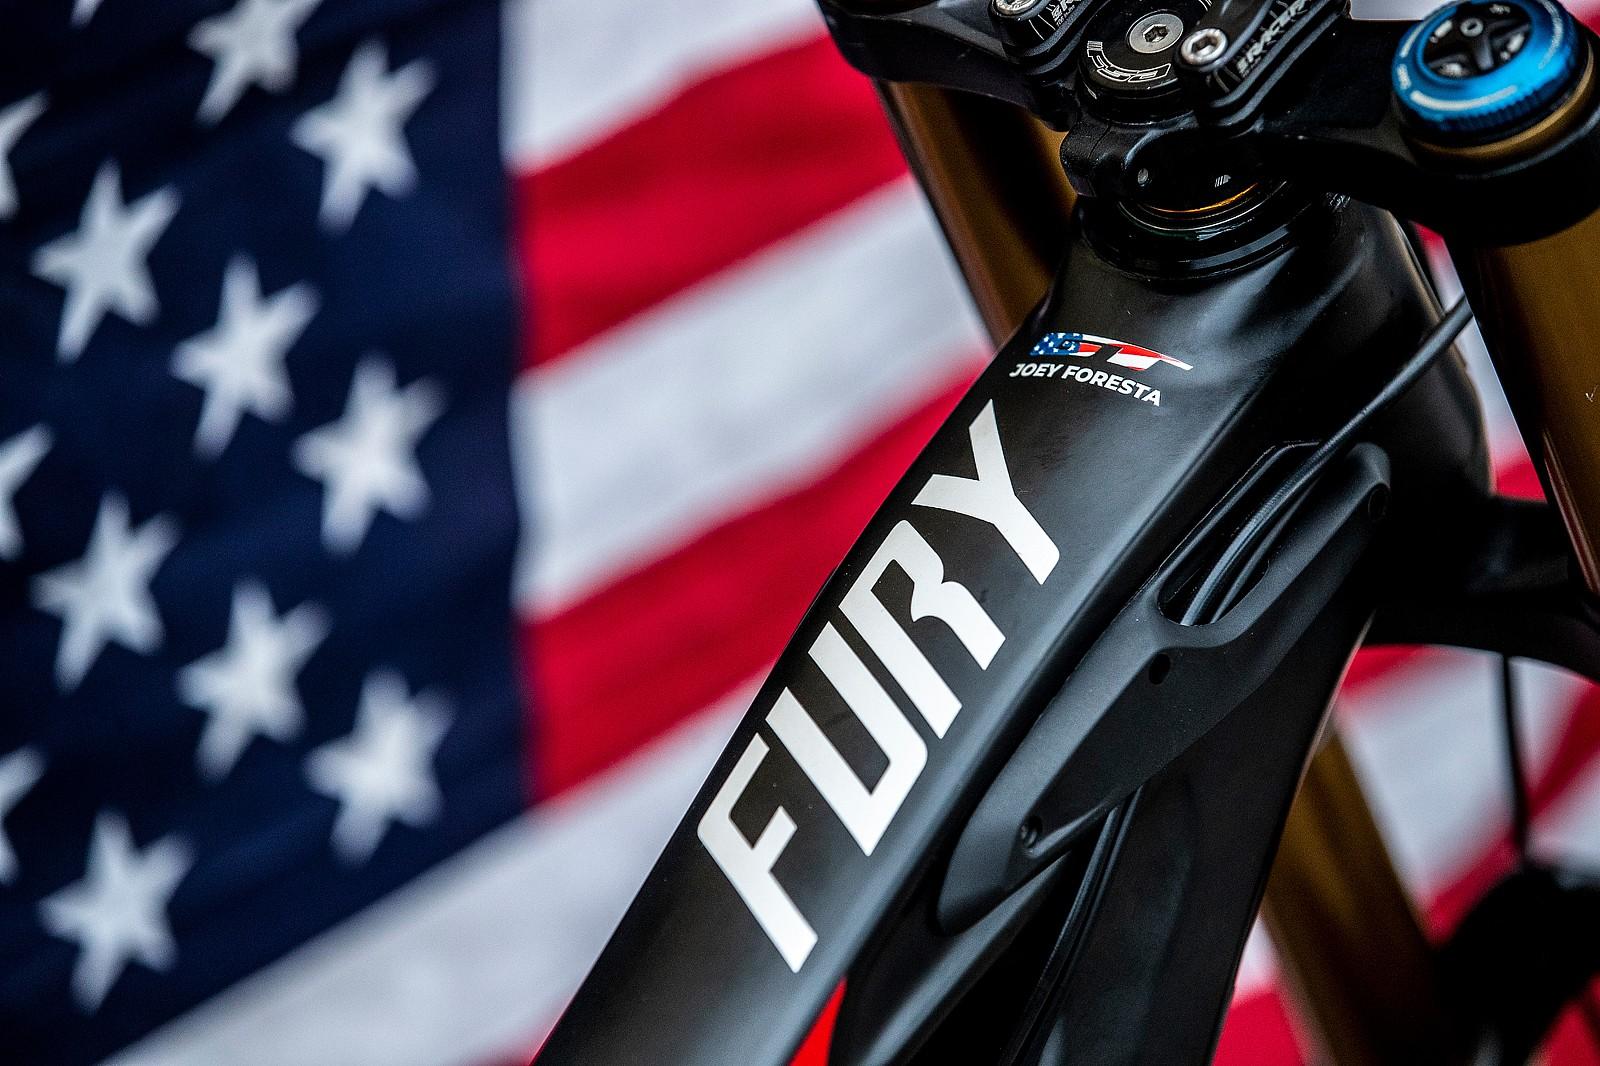 #USDH Fury Schrapler - GT Bicycles World Championships DH Race Bikes - Mountain Biking Pictures - Vital MTB